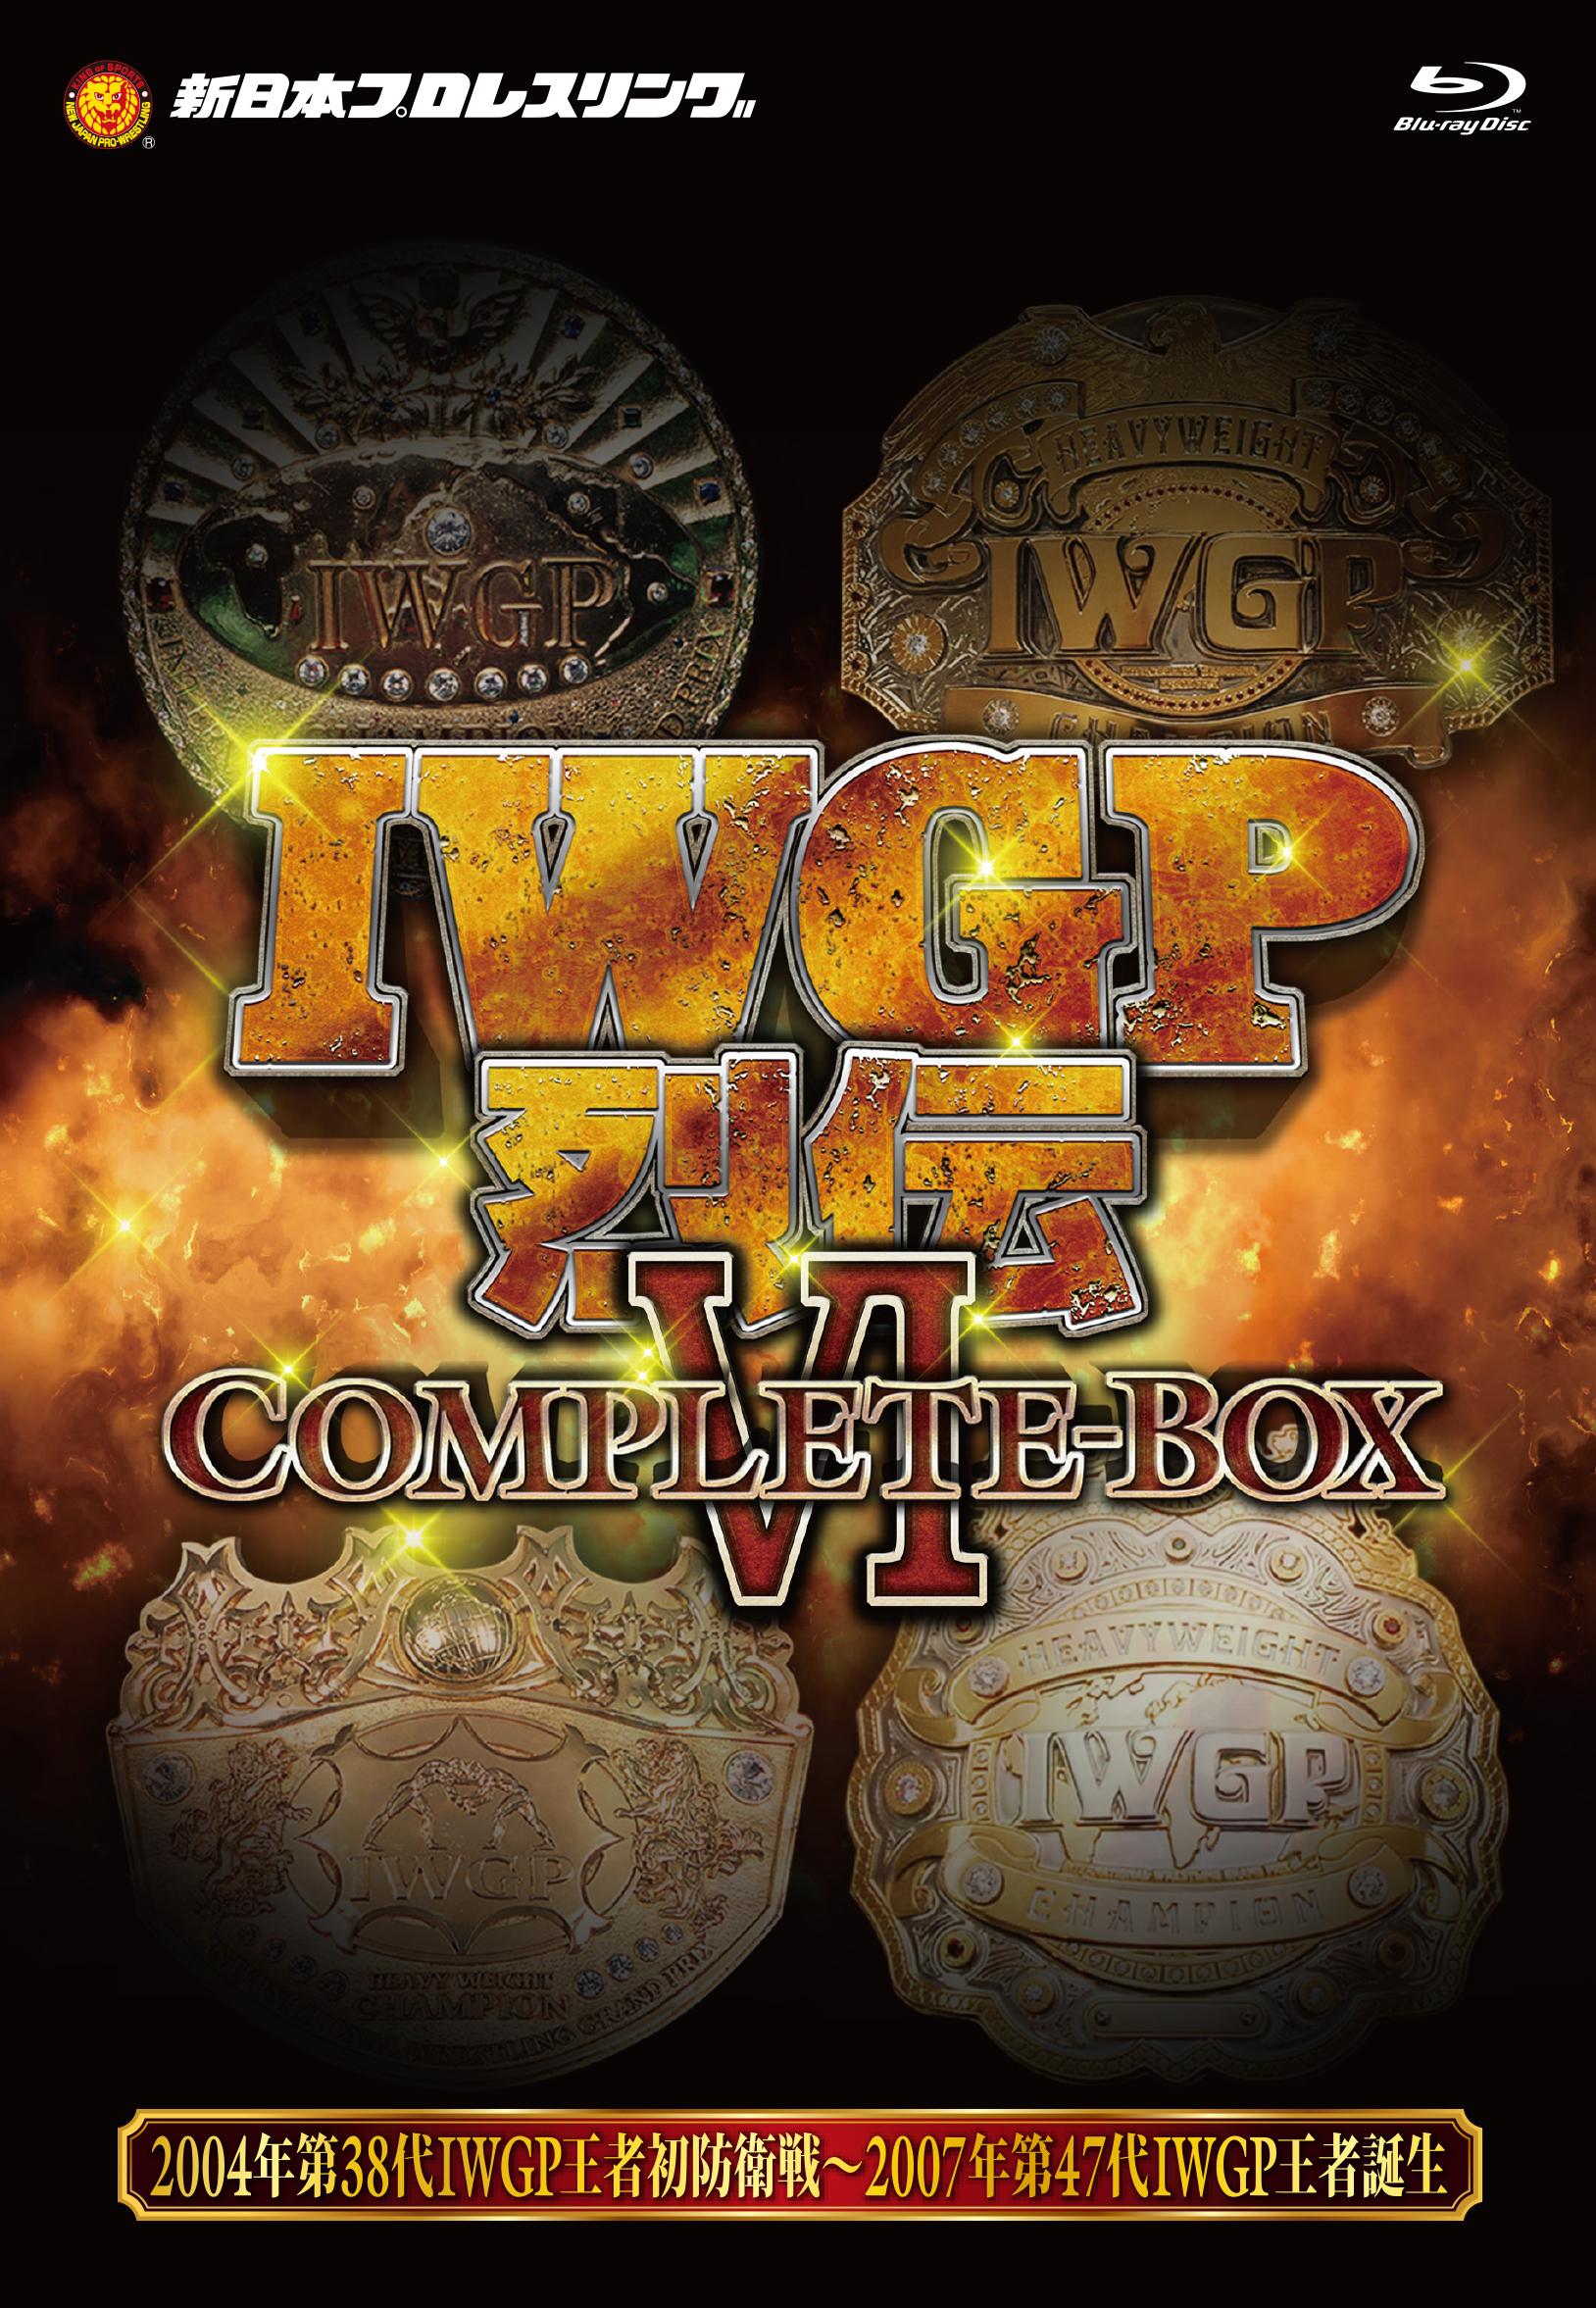 IWGP烈伝COMPLETE-BOX Ⅵ 2004年7月19日第38代IWGPヘビー級王者藤田和之初防衛戦~2007年10月8日第47代IWGPヘビー級王者棚橋弘至誕生までを収録。【Blu-ray-BOX】